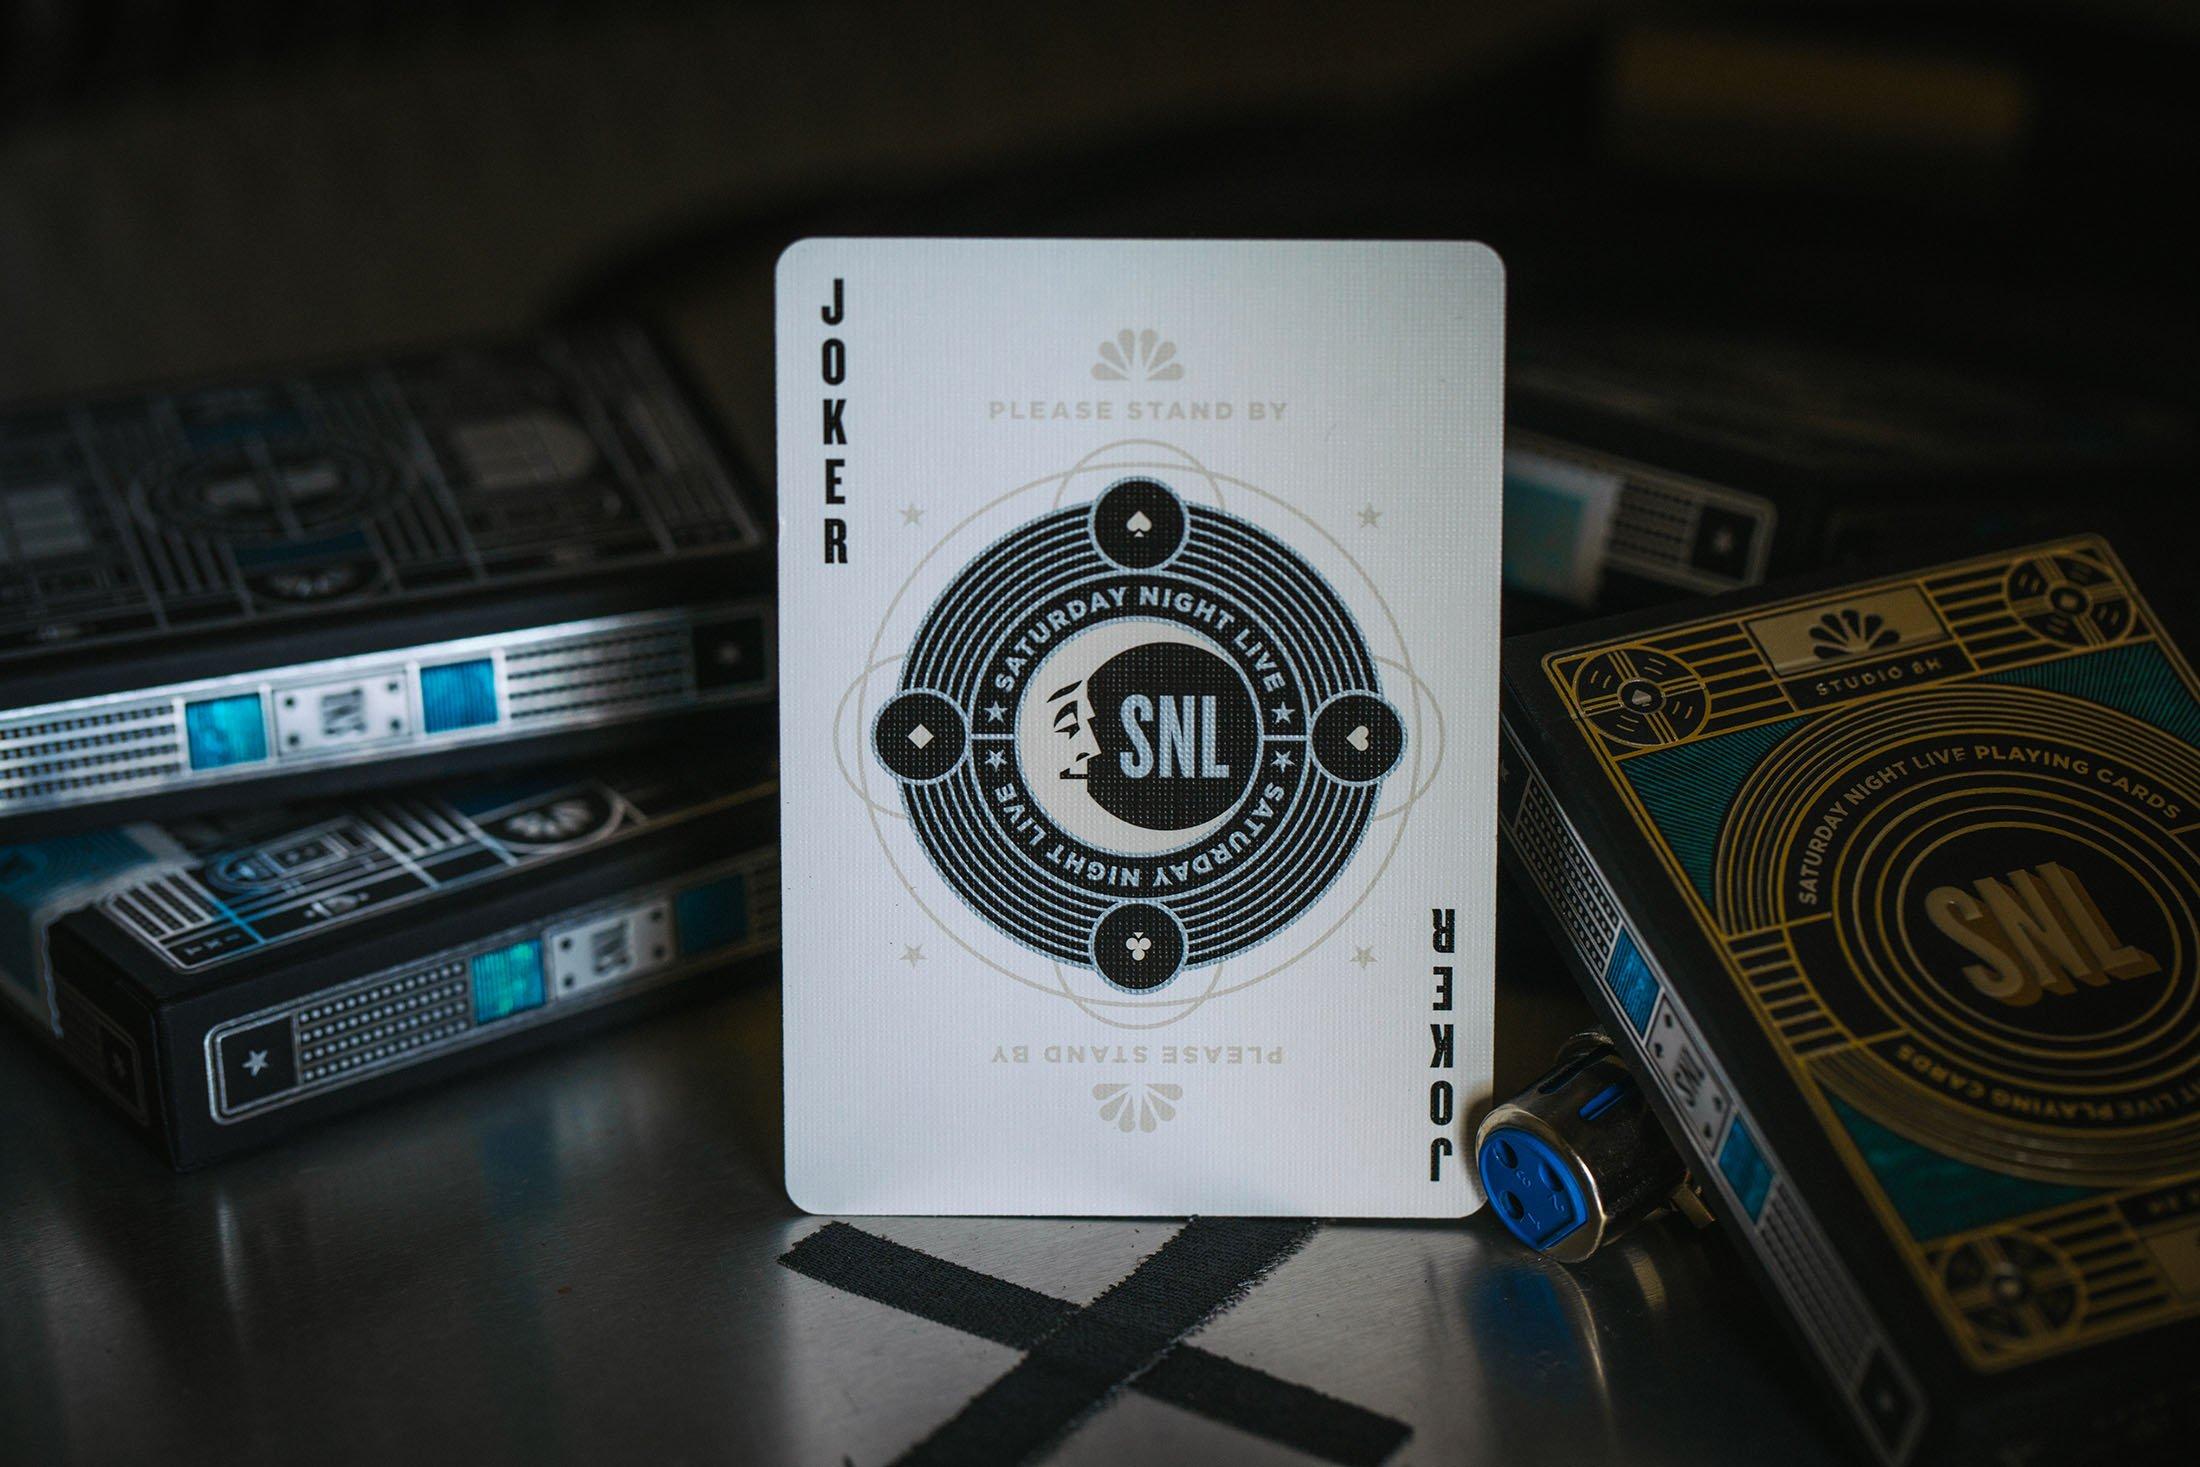 SNL - talia pokerowa od Theory11 - joker